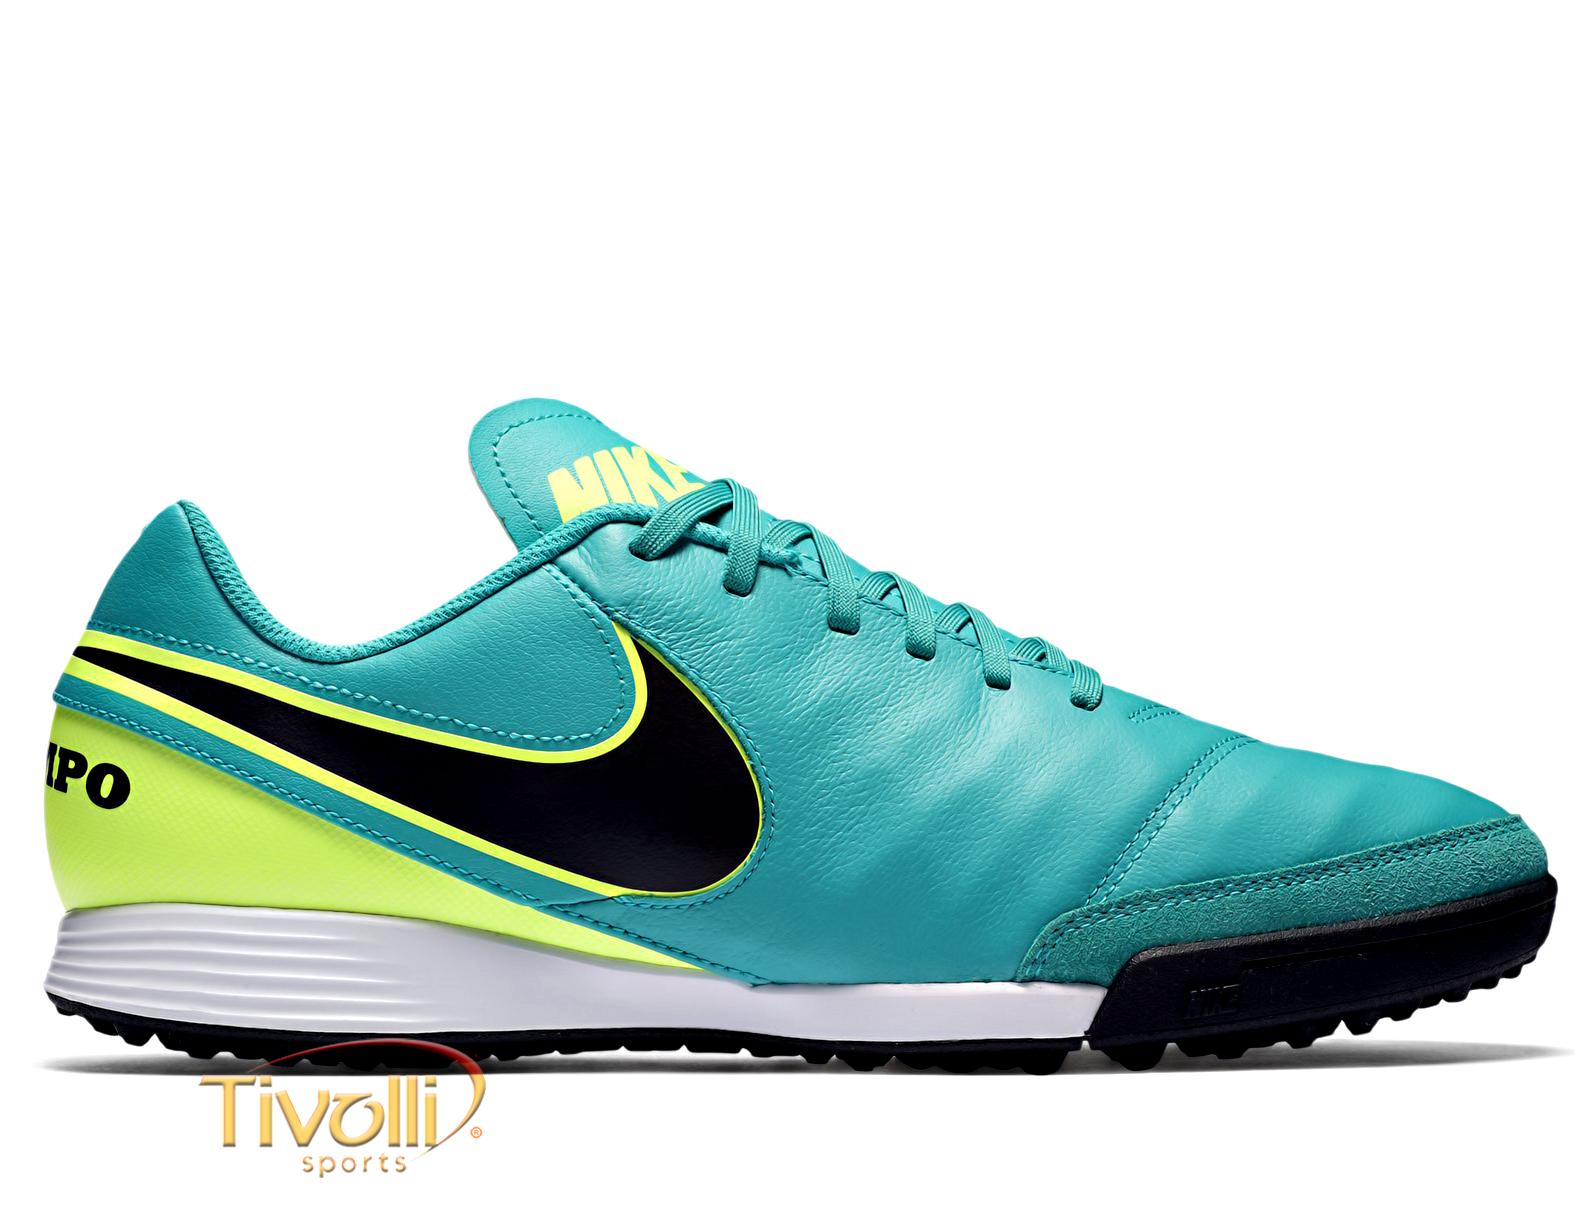 f73a278657 Chuteira Nike Tiempo Genio II Leather TF Society